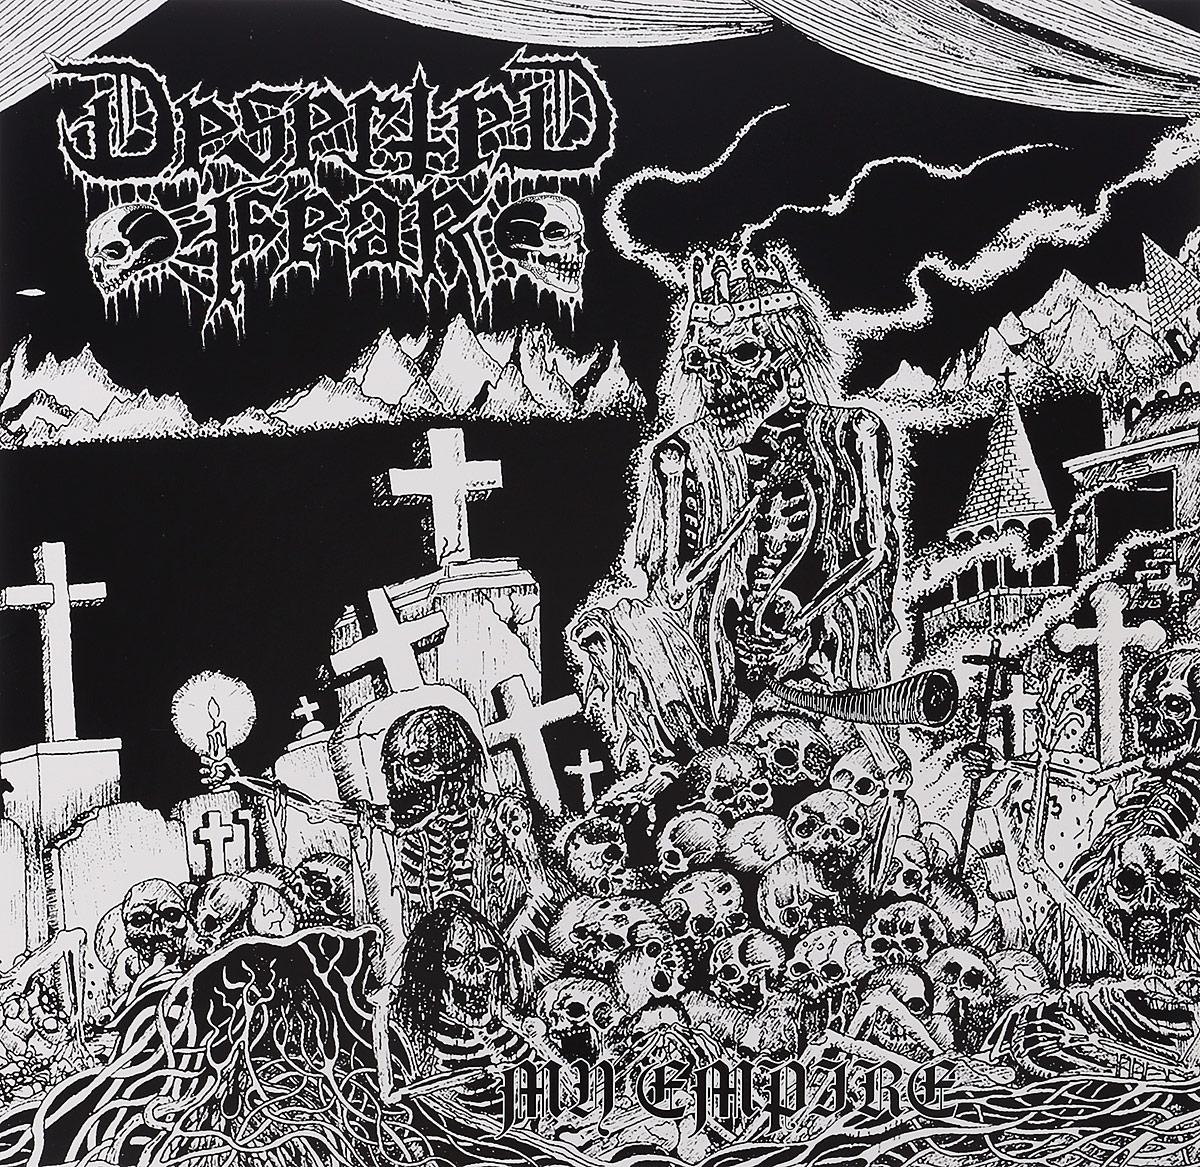 Deserted Fear Deserted Fear. My Empire (LP + CD) fear itself